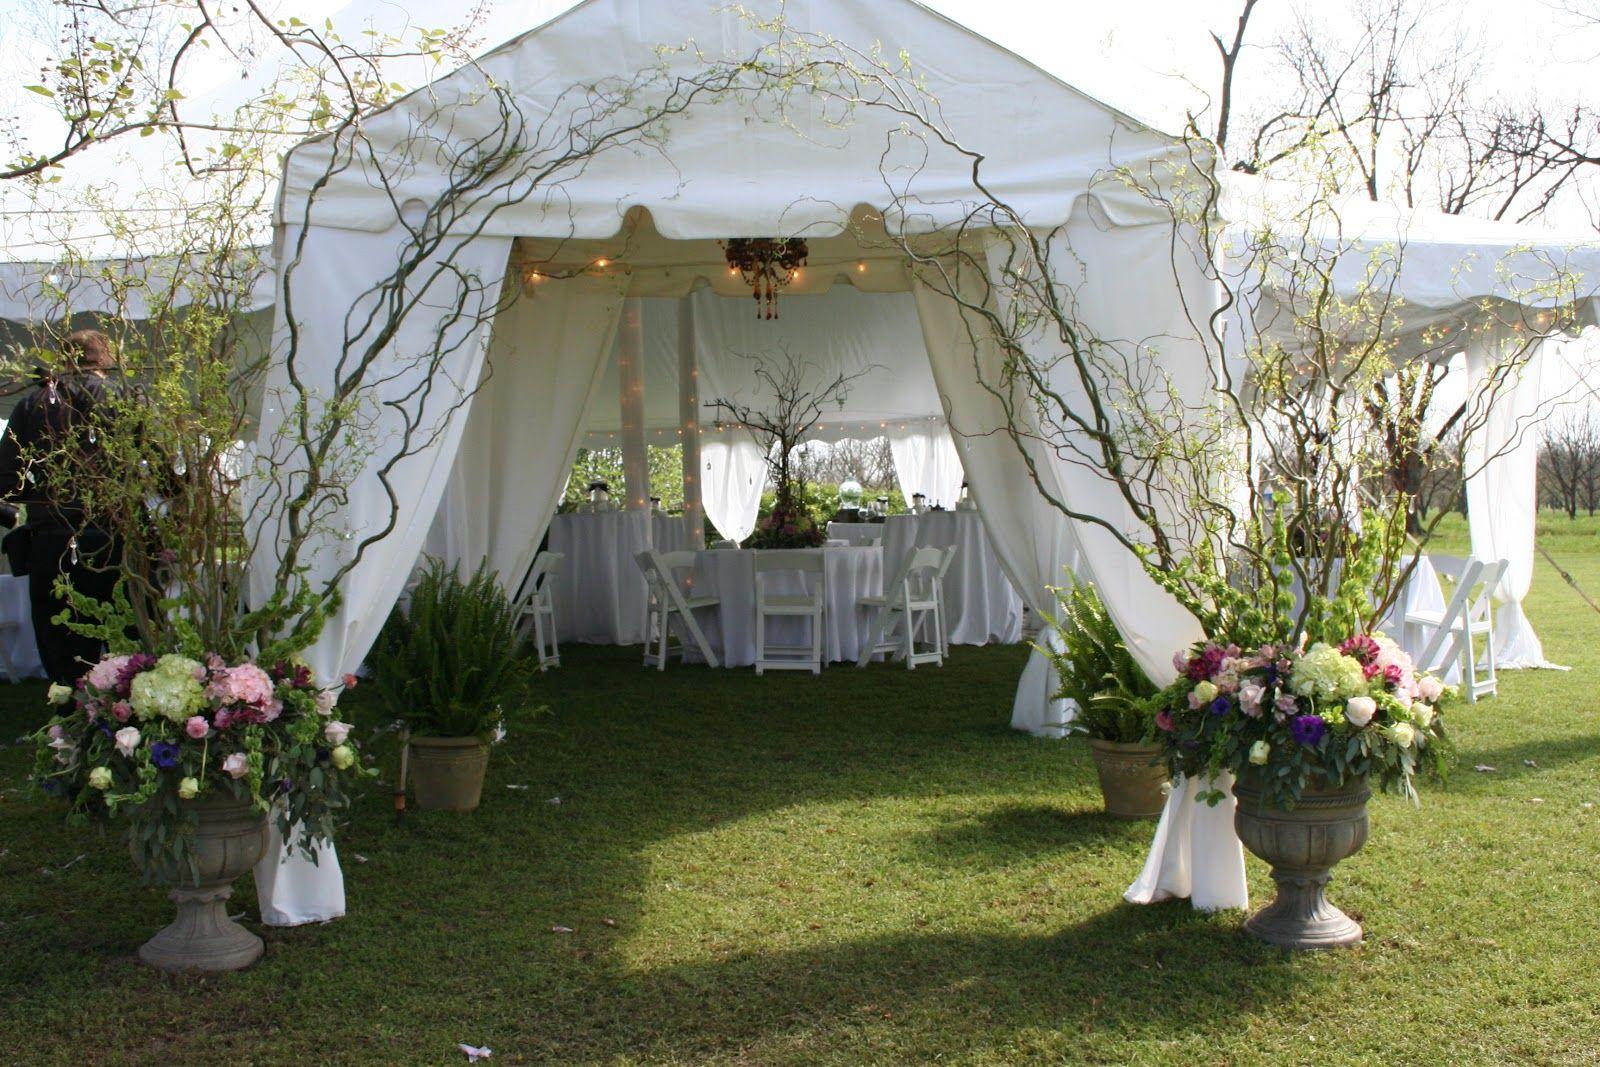 Tent Weddings Tips And Ideas Gazebo Wedding Wedding Ceremony